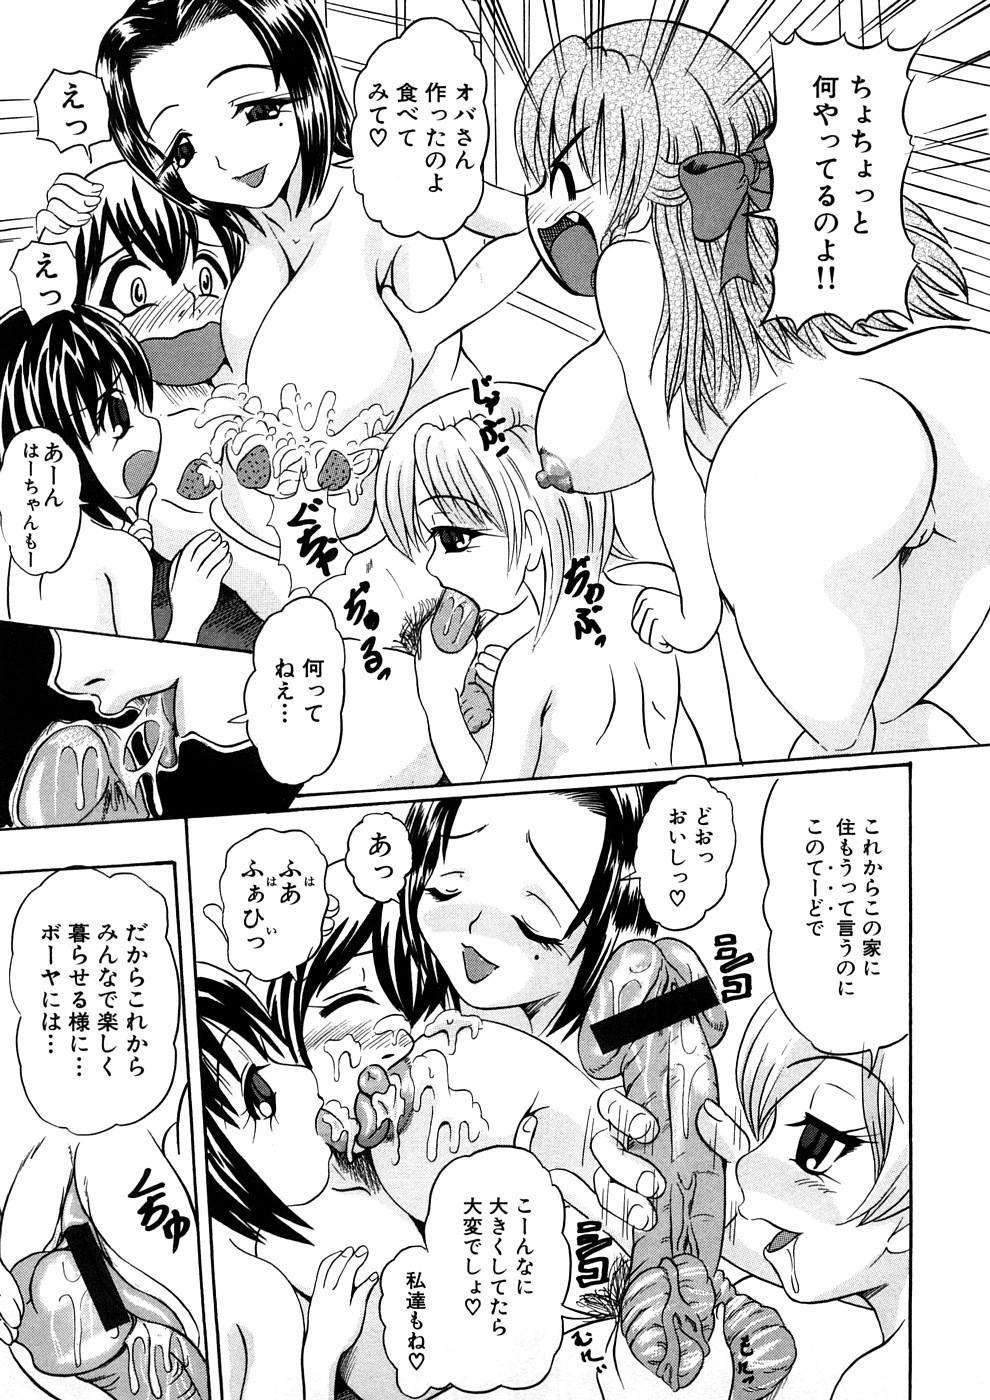 Geki Yaba Anthology Vol. 1 - Naka ni Dashite yo 75